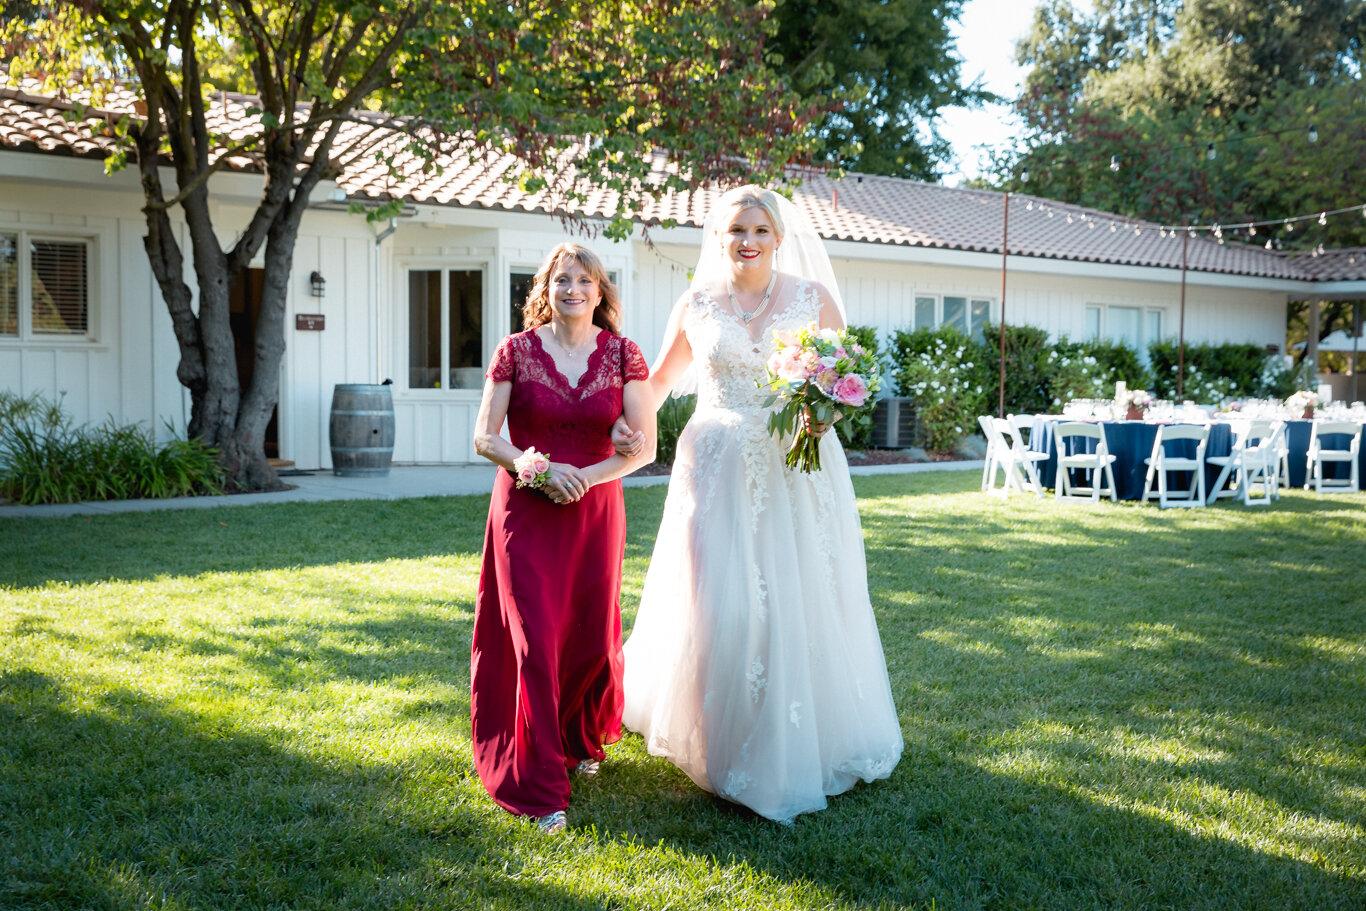 2019.08.24_Emily-Ashir-Wedding-at-the-Maples-5744.jpg